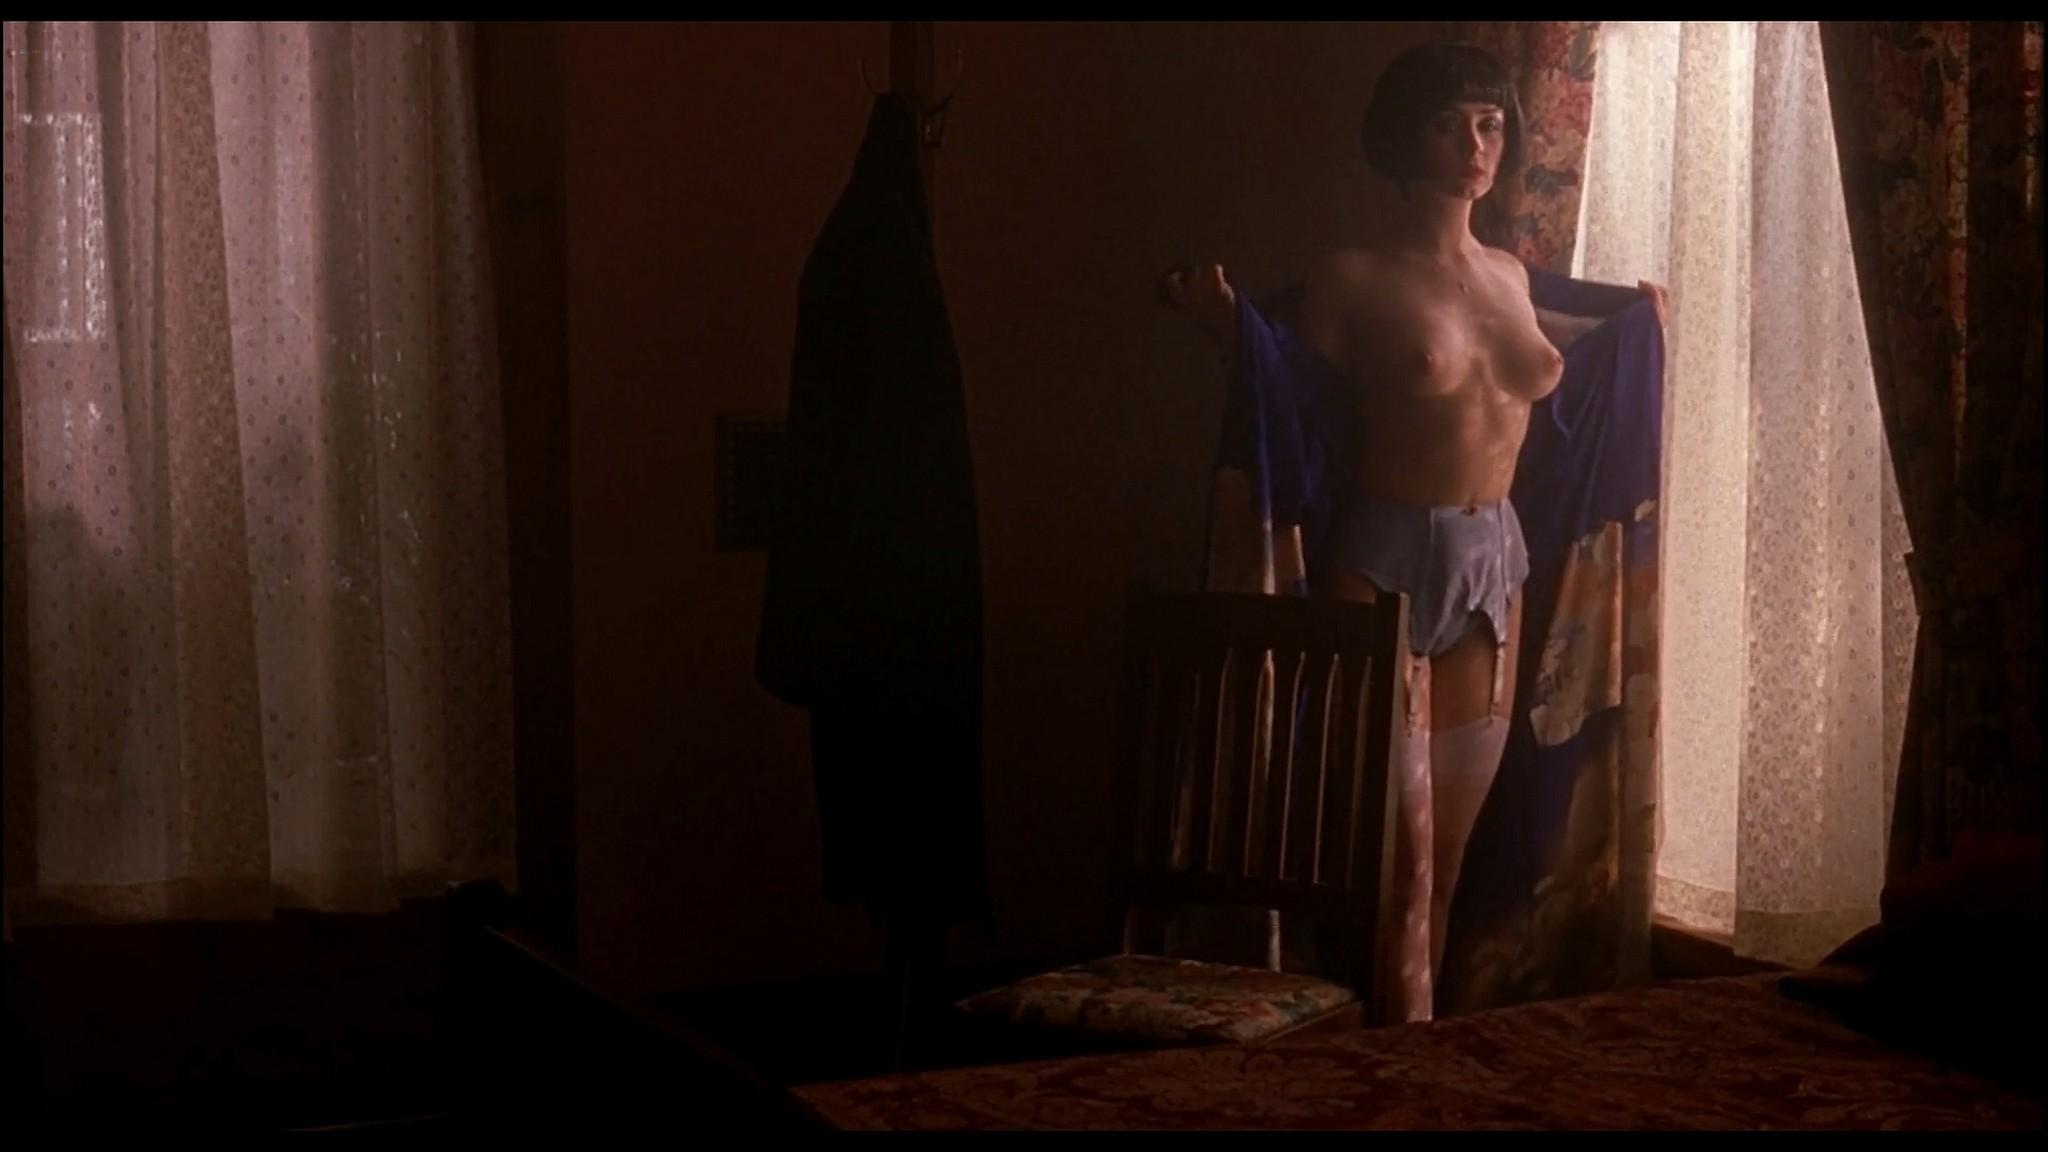 Nina Siemaszko nude sex Lydie Denier Gloria Reuben and others nude sex Wild Orchid 2 1992 1080p BluRay 12